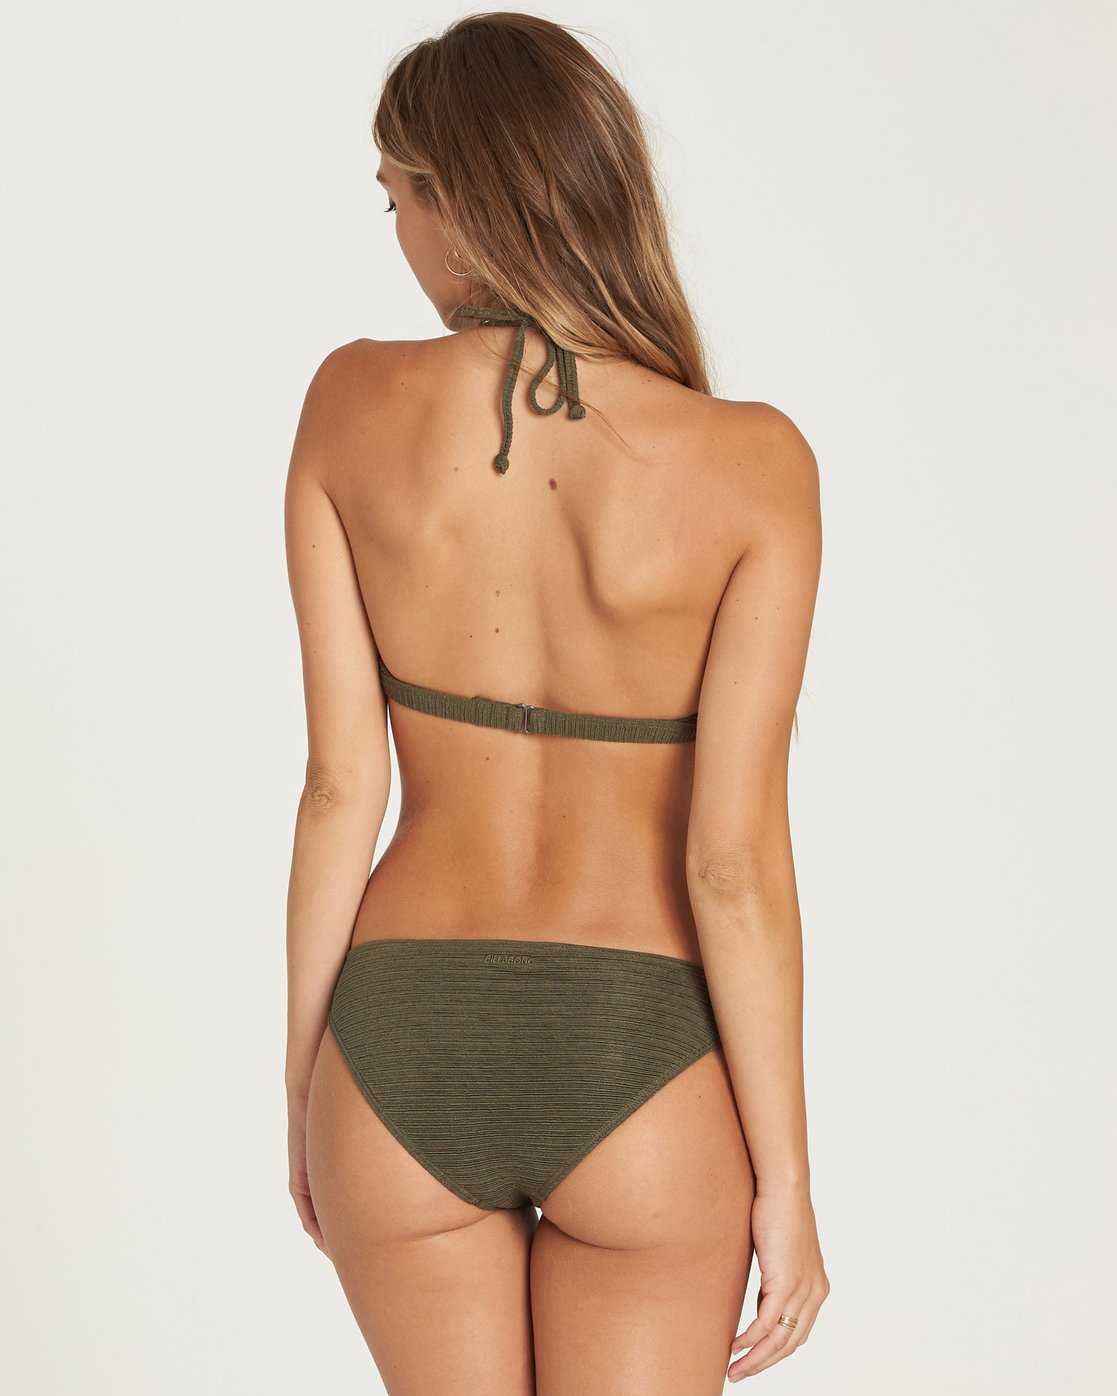 0f8af25084 0 No Hurry Lowrider Bikini Bottom Green XB20QBNO Billabong